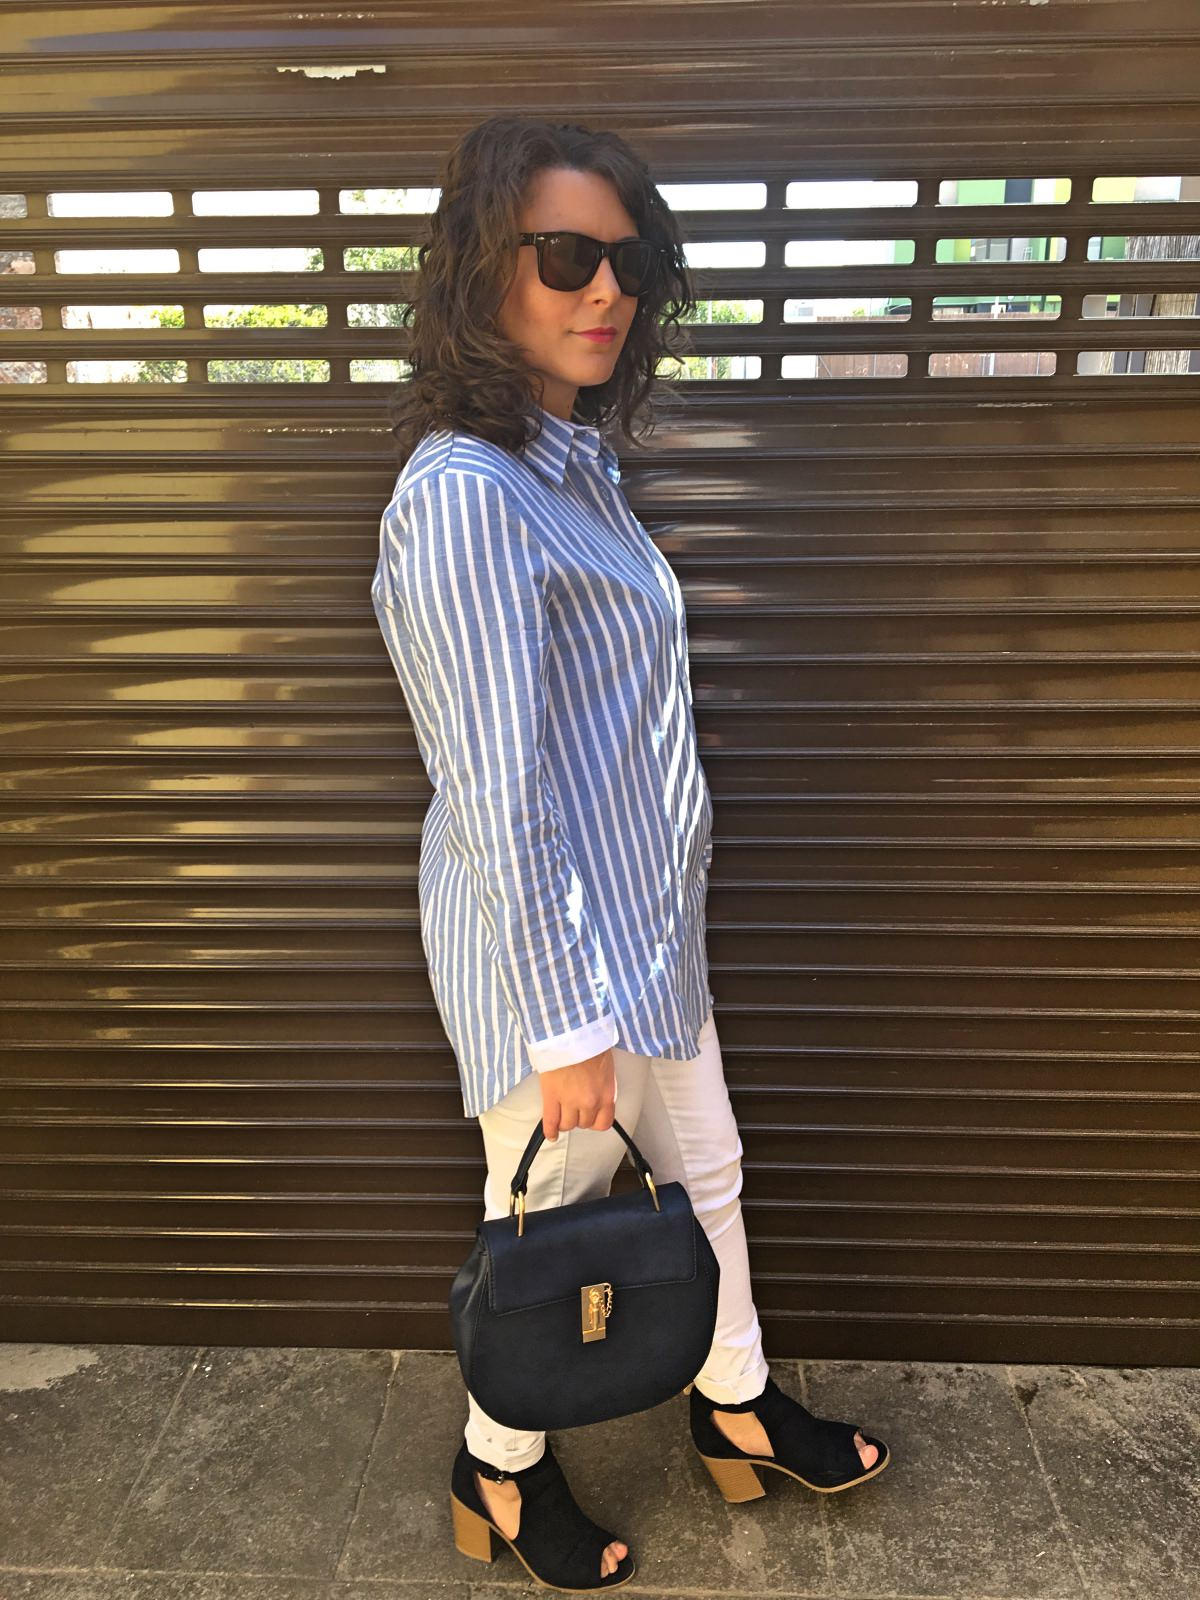 look_blusaderayas_fashionblogger_mivestidoazul-com_influencer_blogdemoda_castellonmg_1847